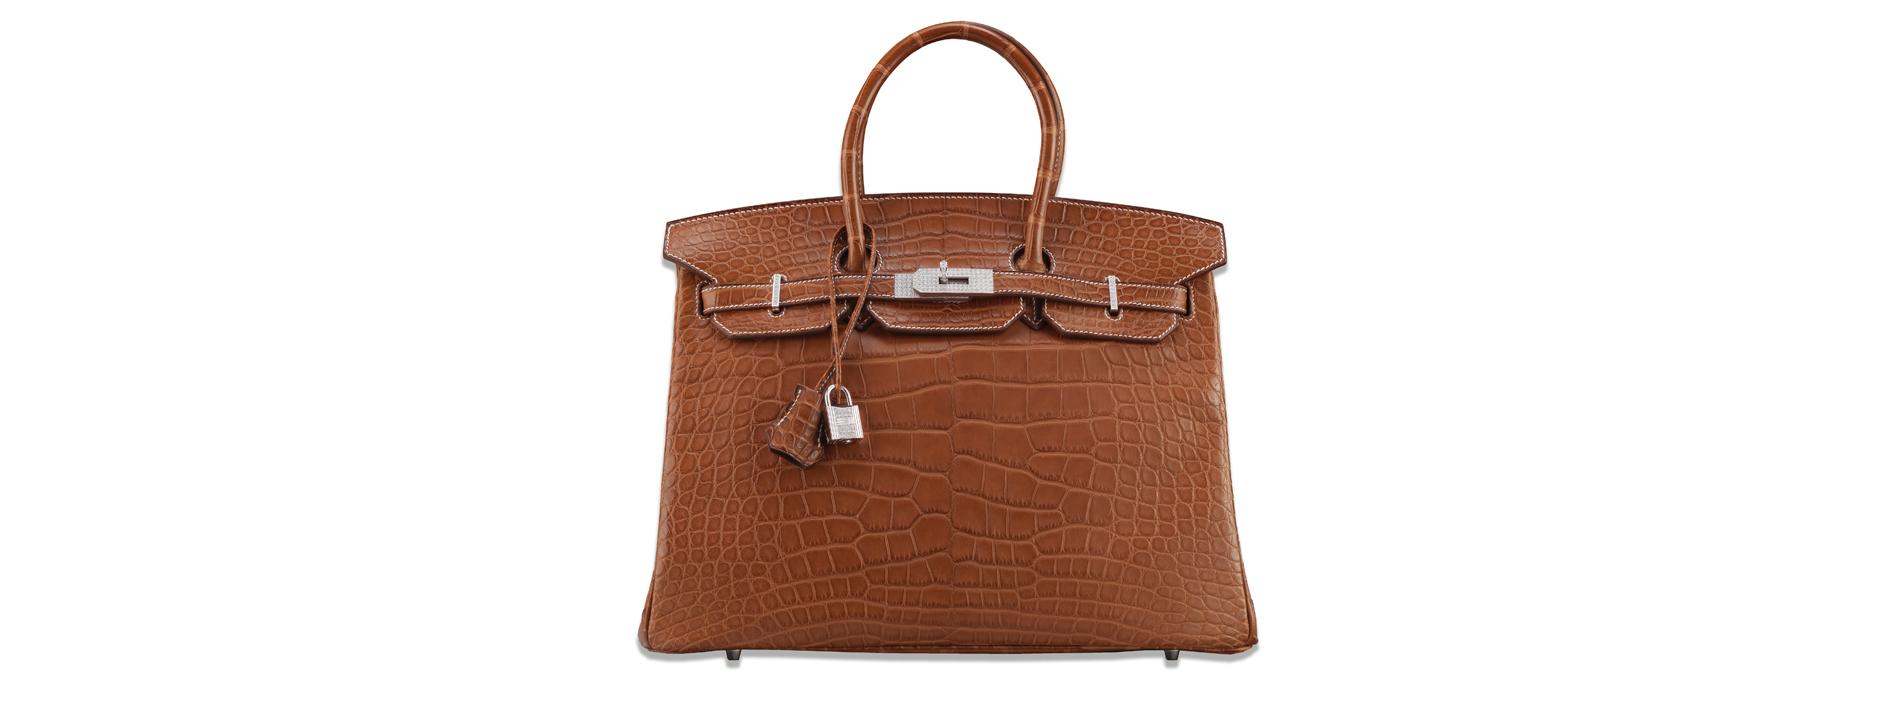 d855f816022f Private Sales | Handbags | Christie's